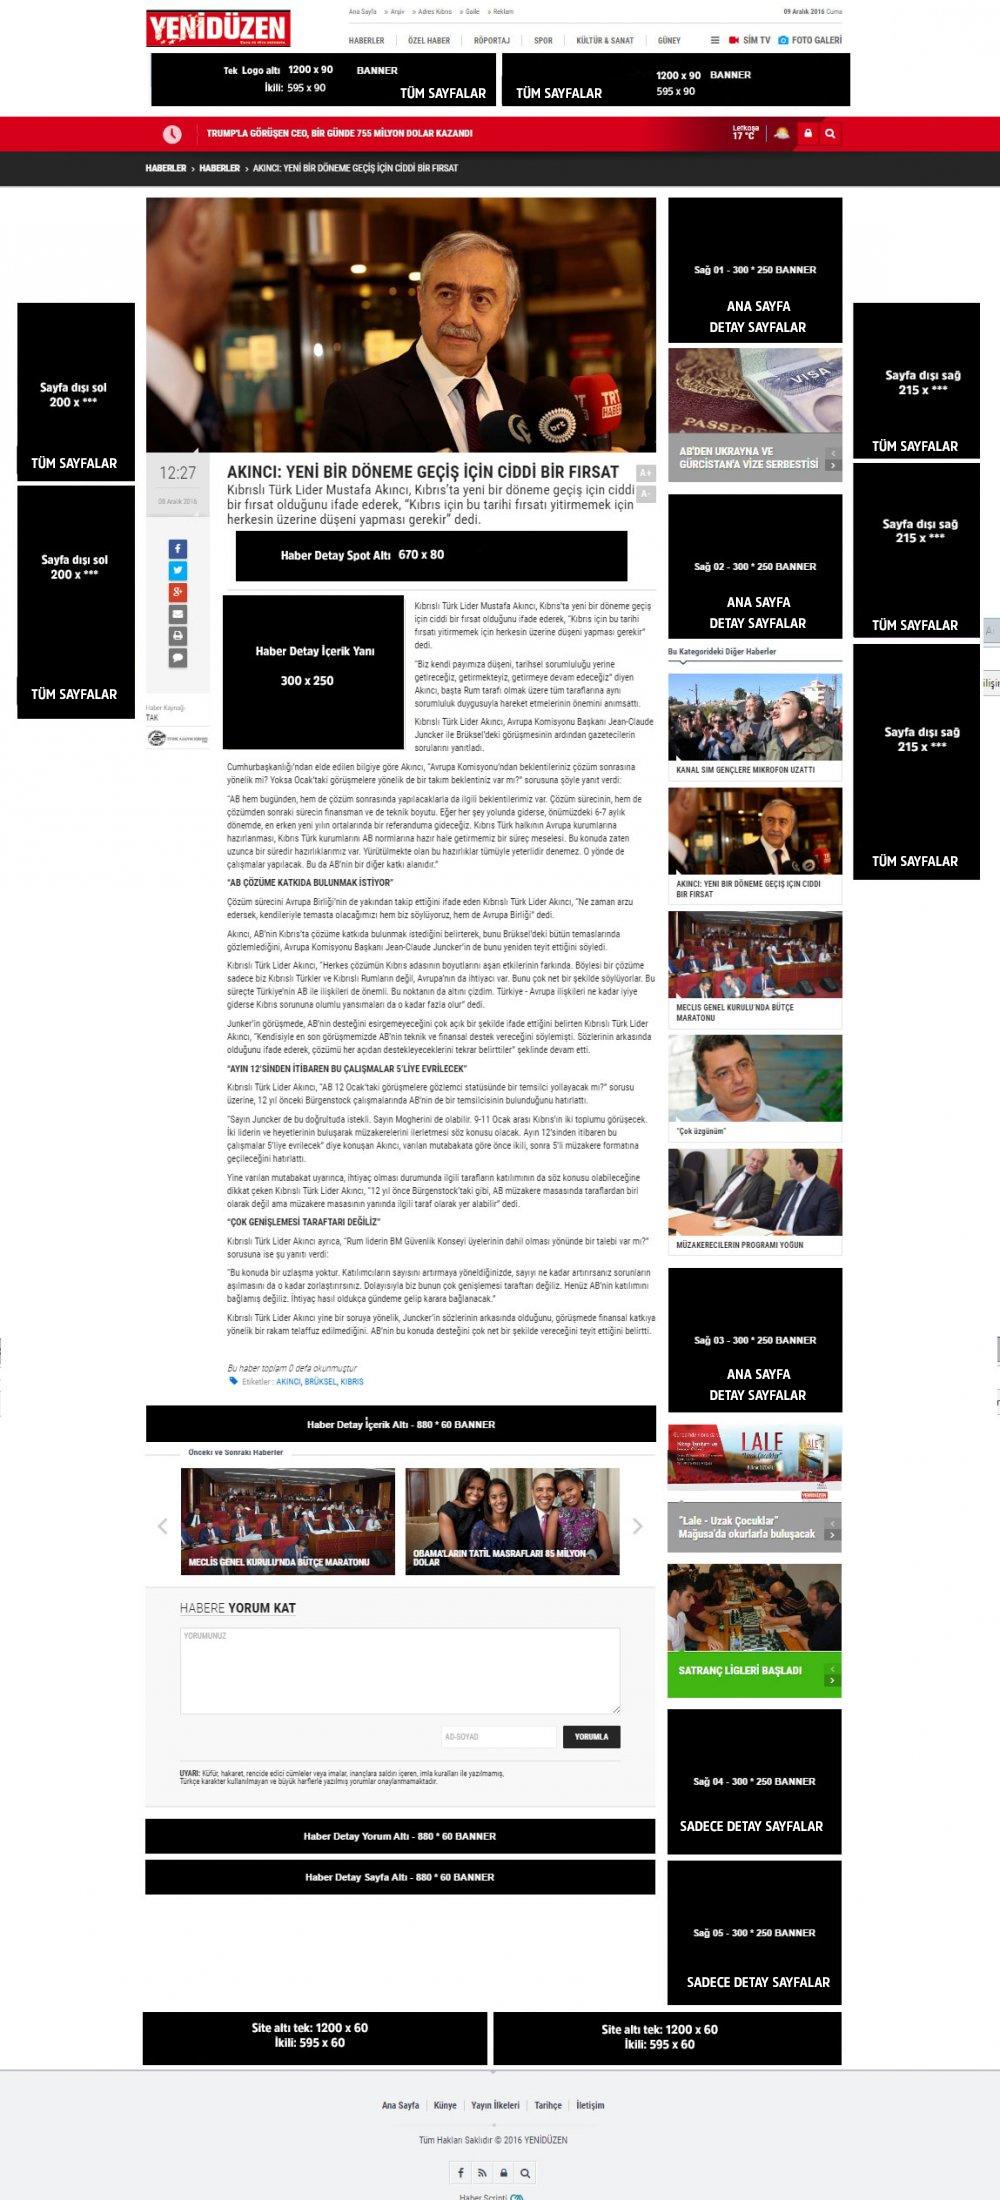 detay-sayfa-reklam-001.jpg